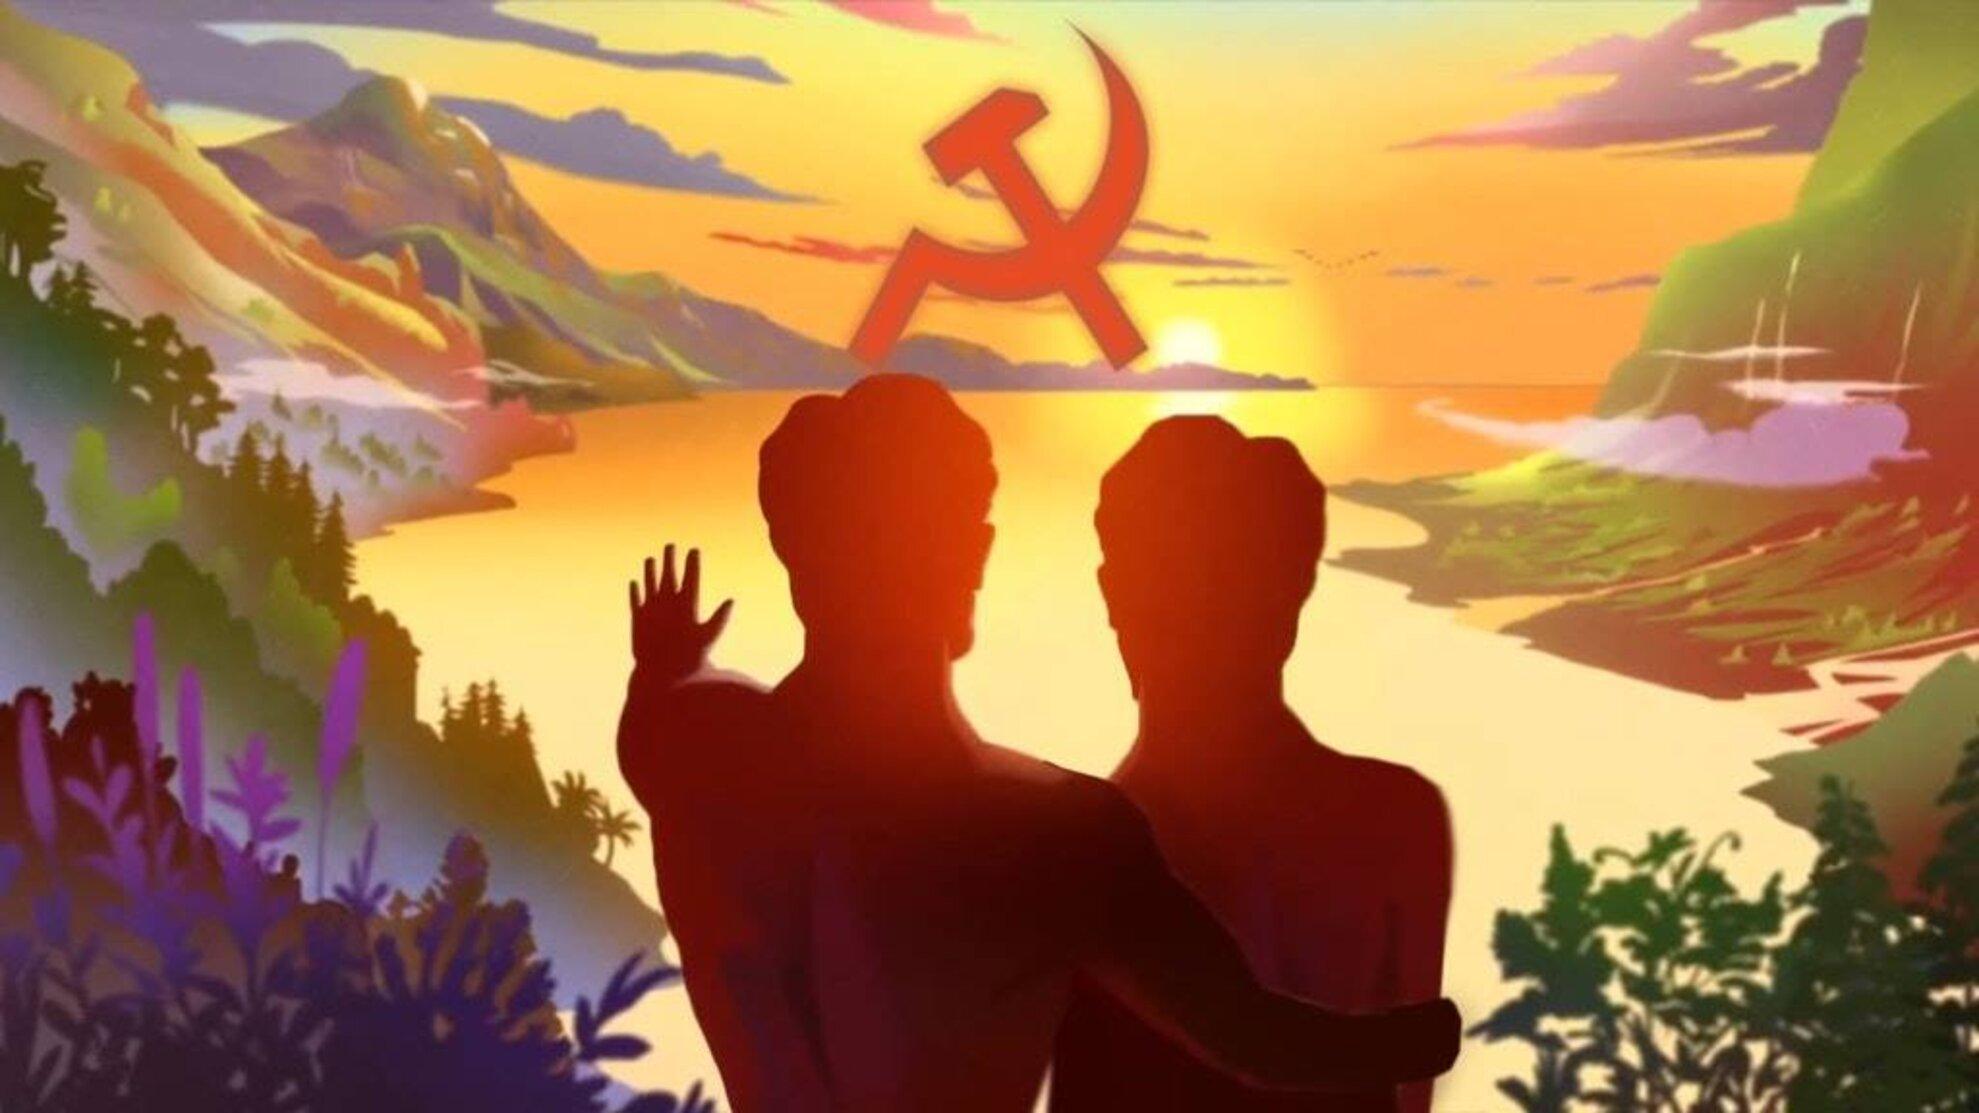 Communist & Queer: LGBTI rights after October Revolution